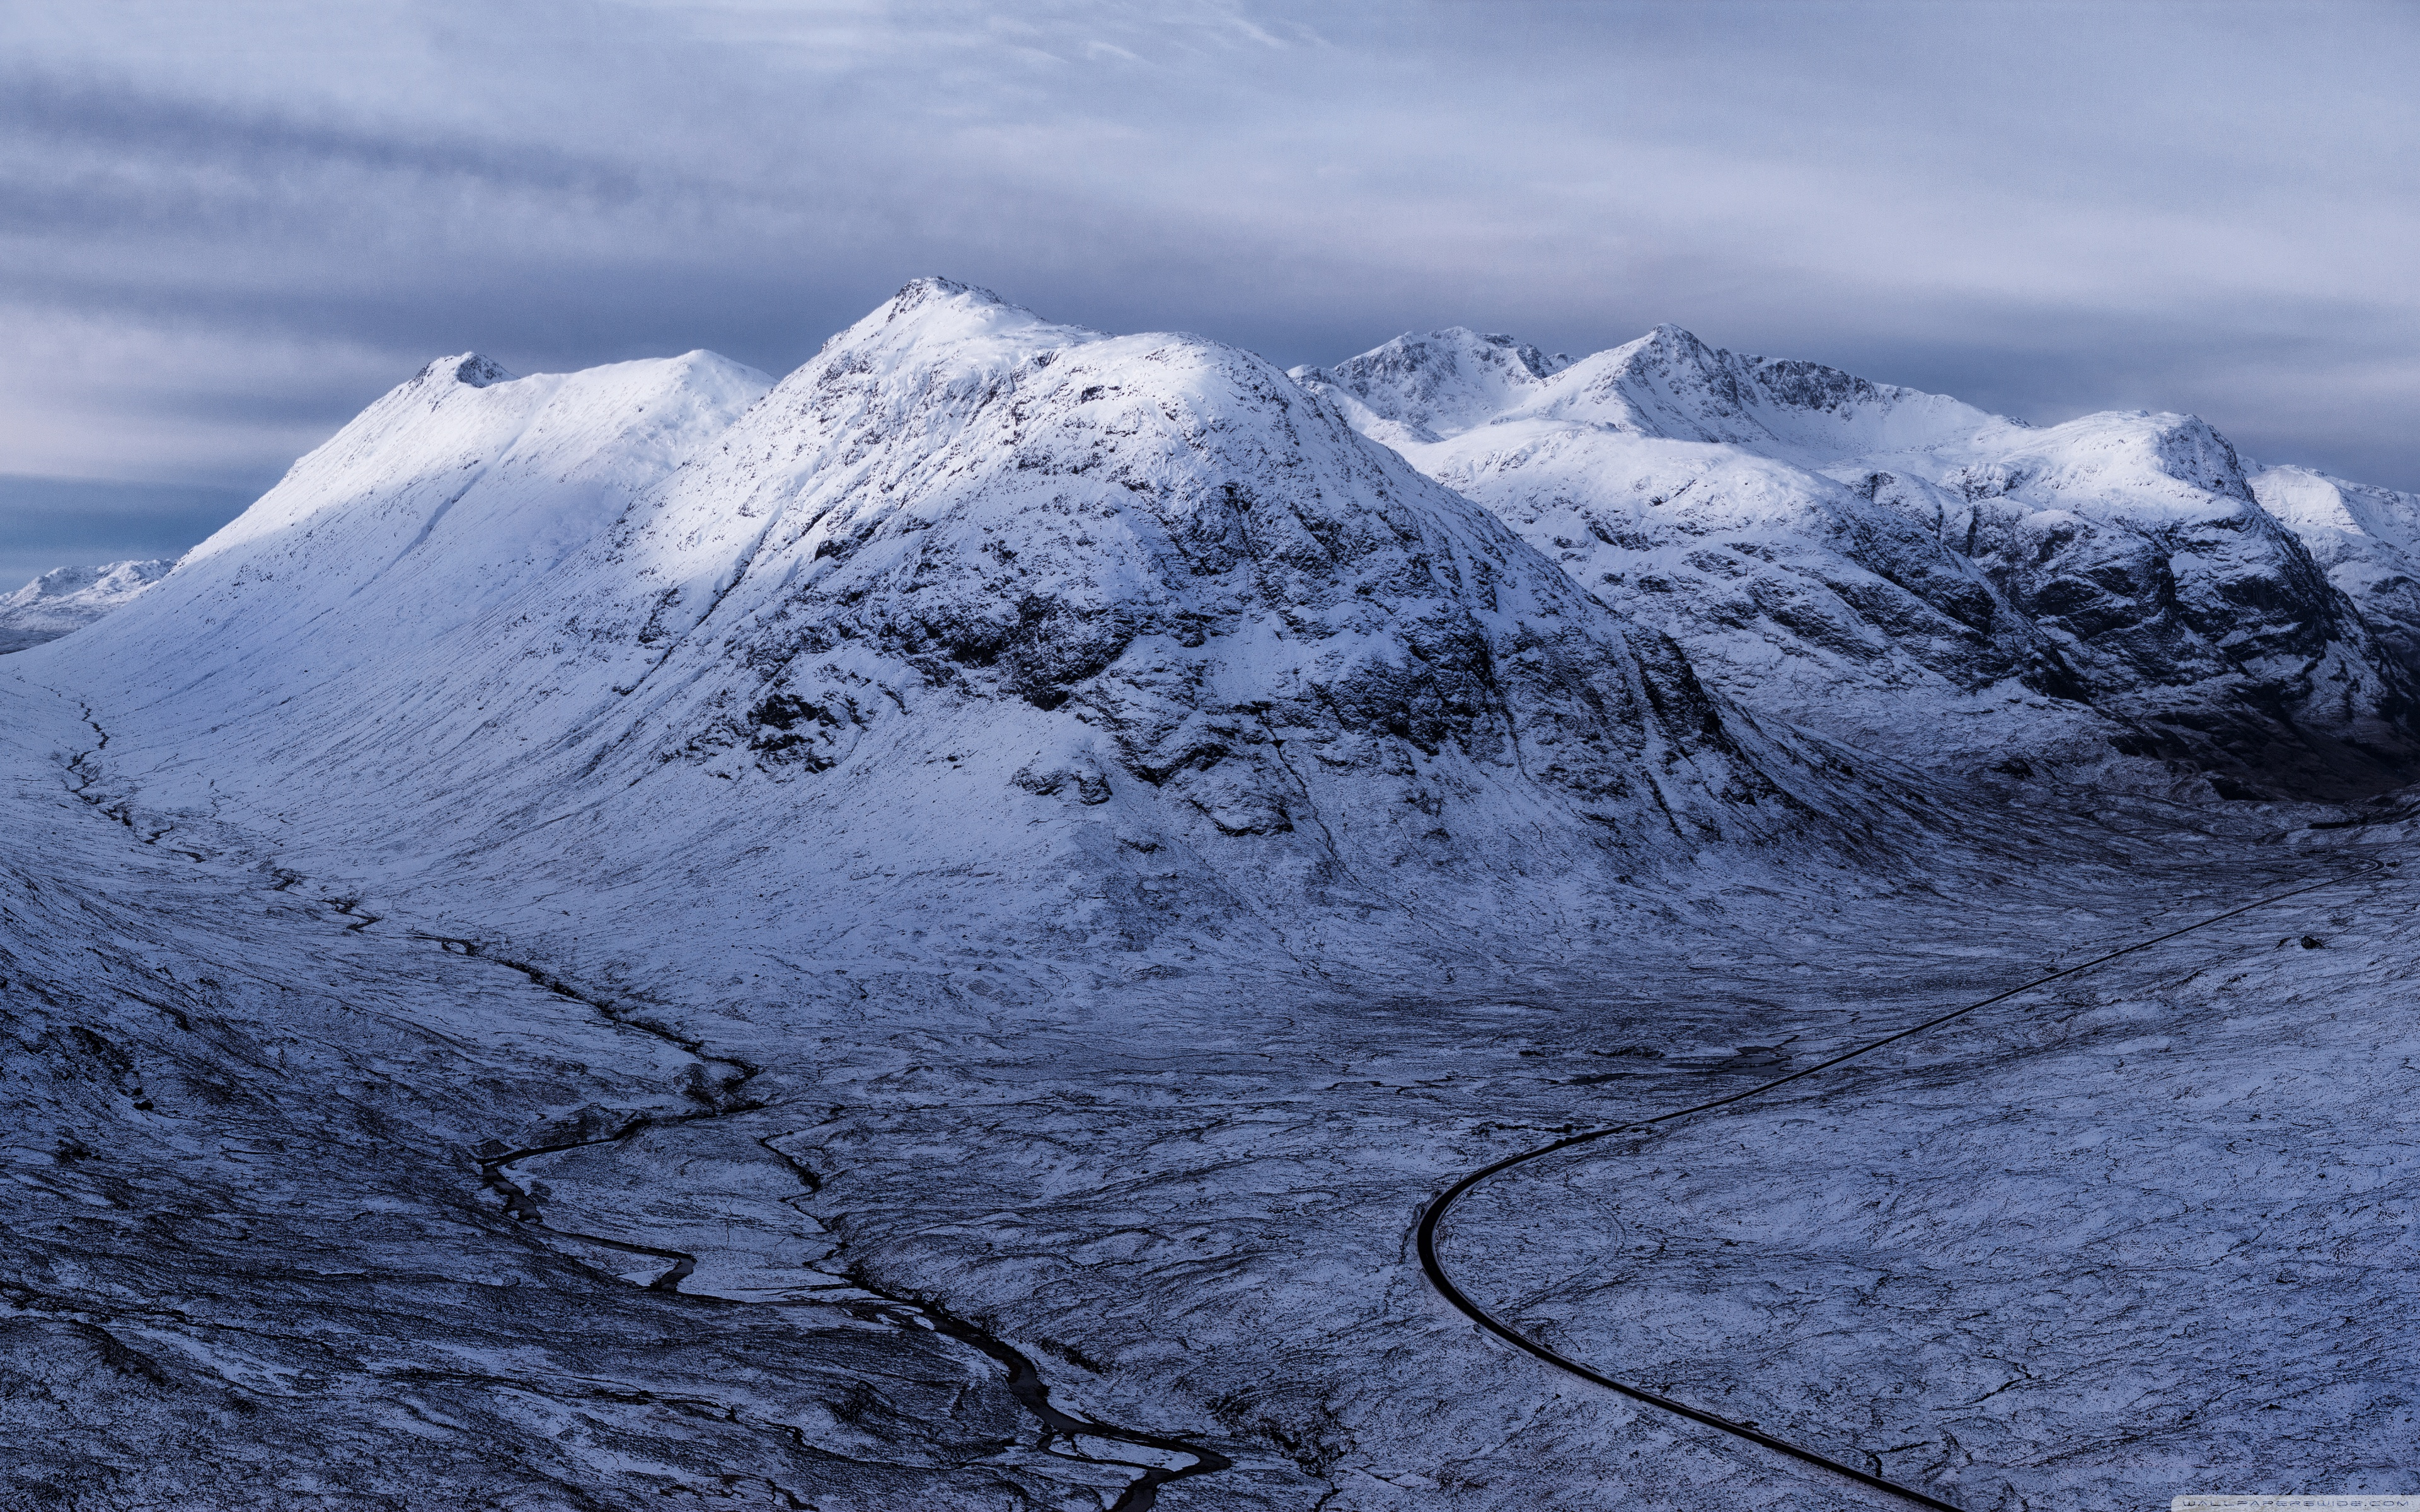 glencoe highlands of scotland, winter ❤ 4k hd desktop wallpaper for